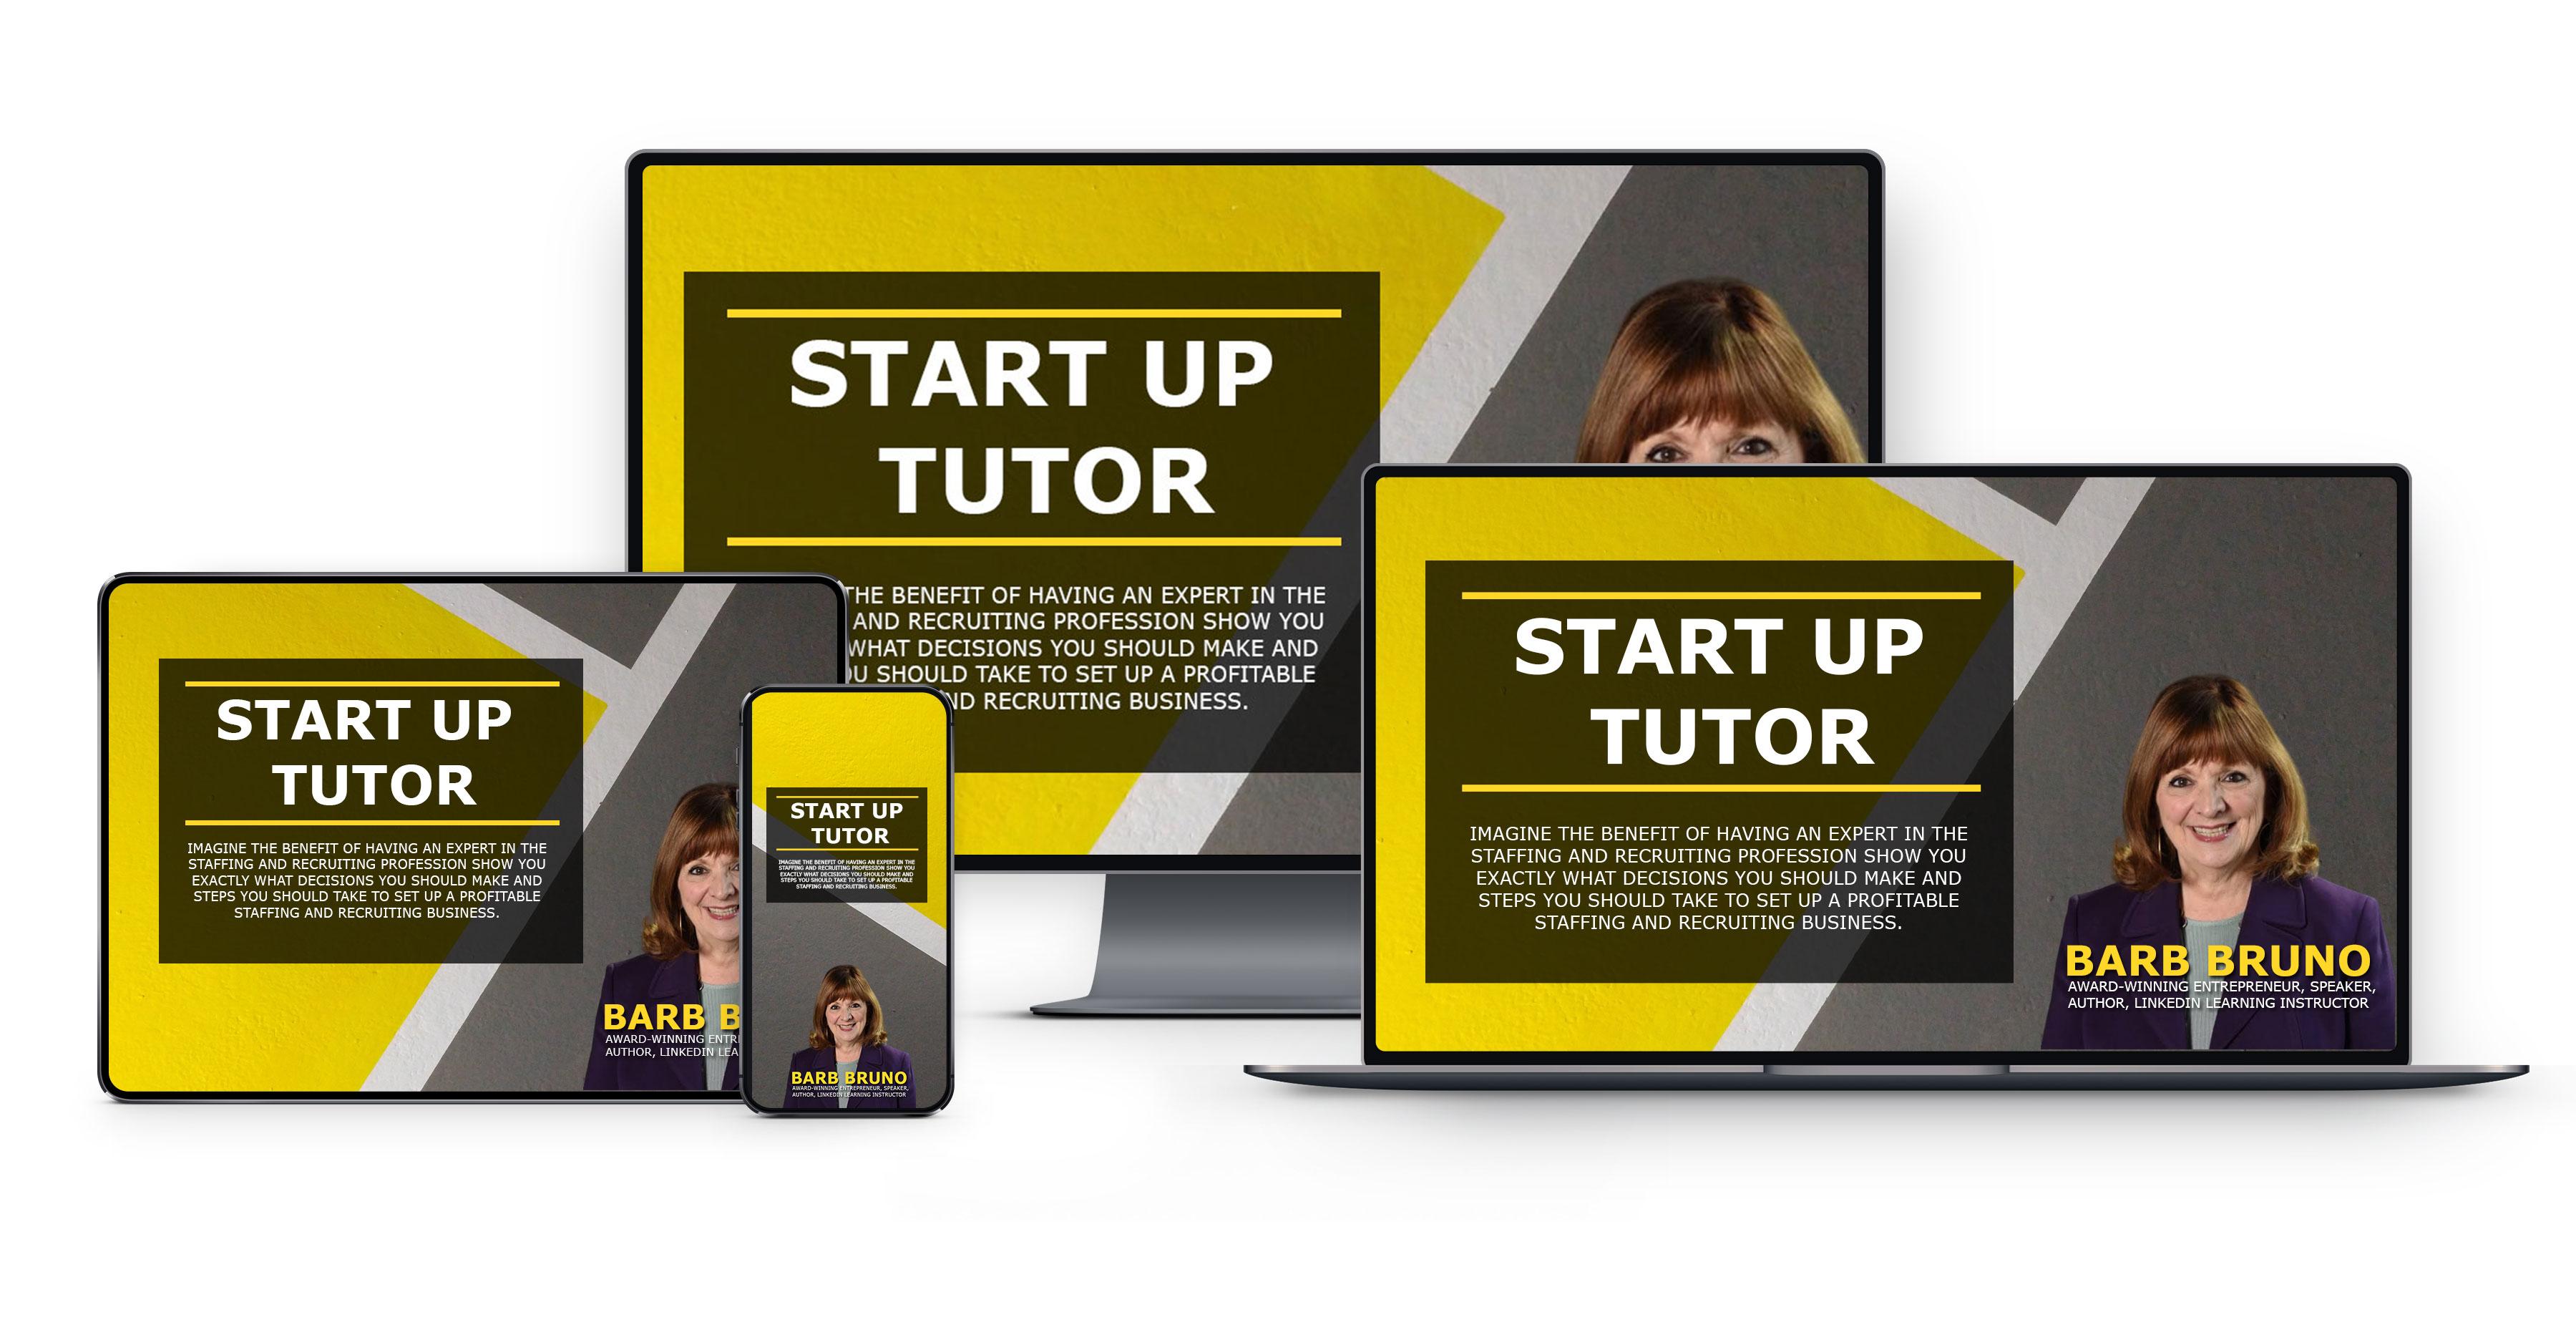 start-up-tutor